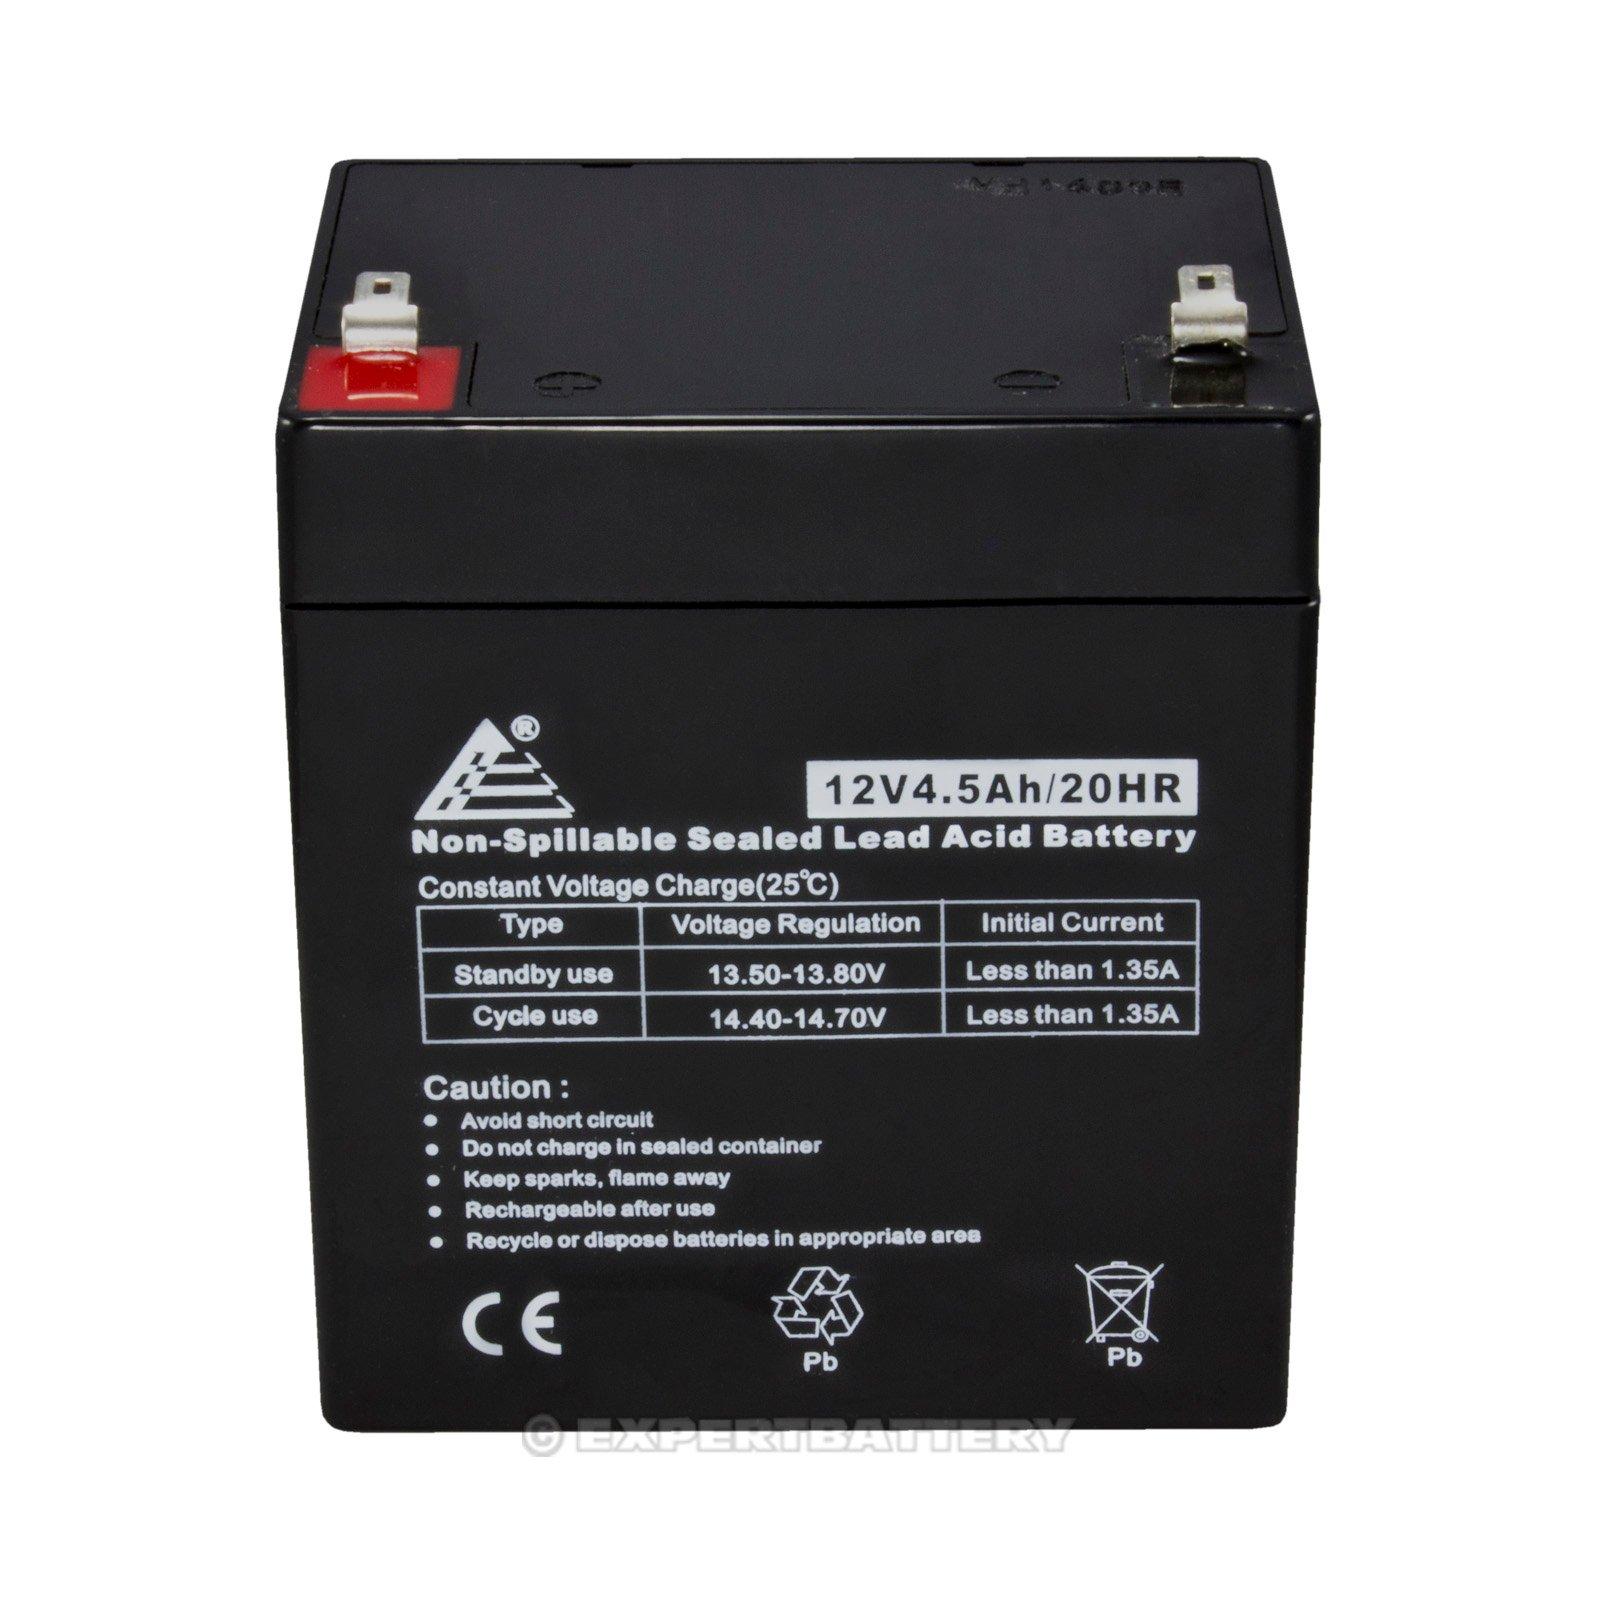 Set Of 2 12v 45ah Sla For Razor E100 E125 E150 Electric Scooter Ups Anti Spark Circuit Built Into The Battery Pack Batteries